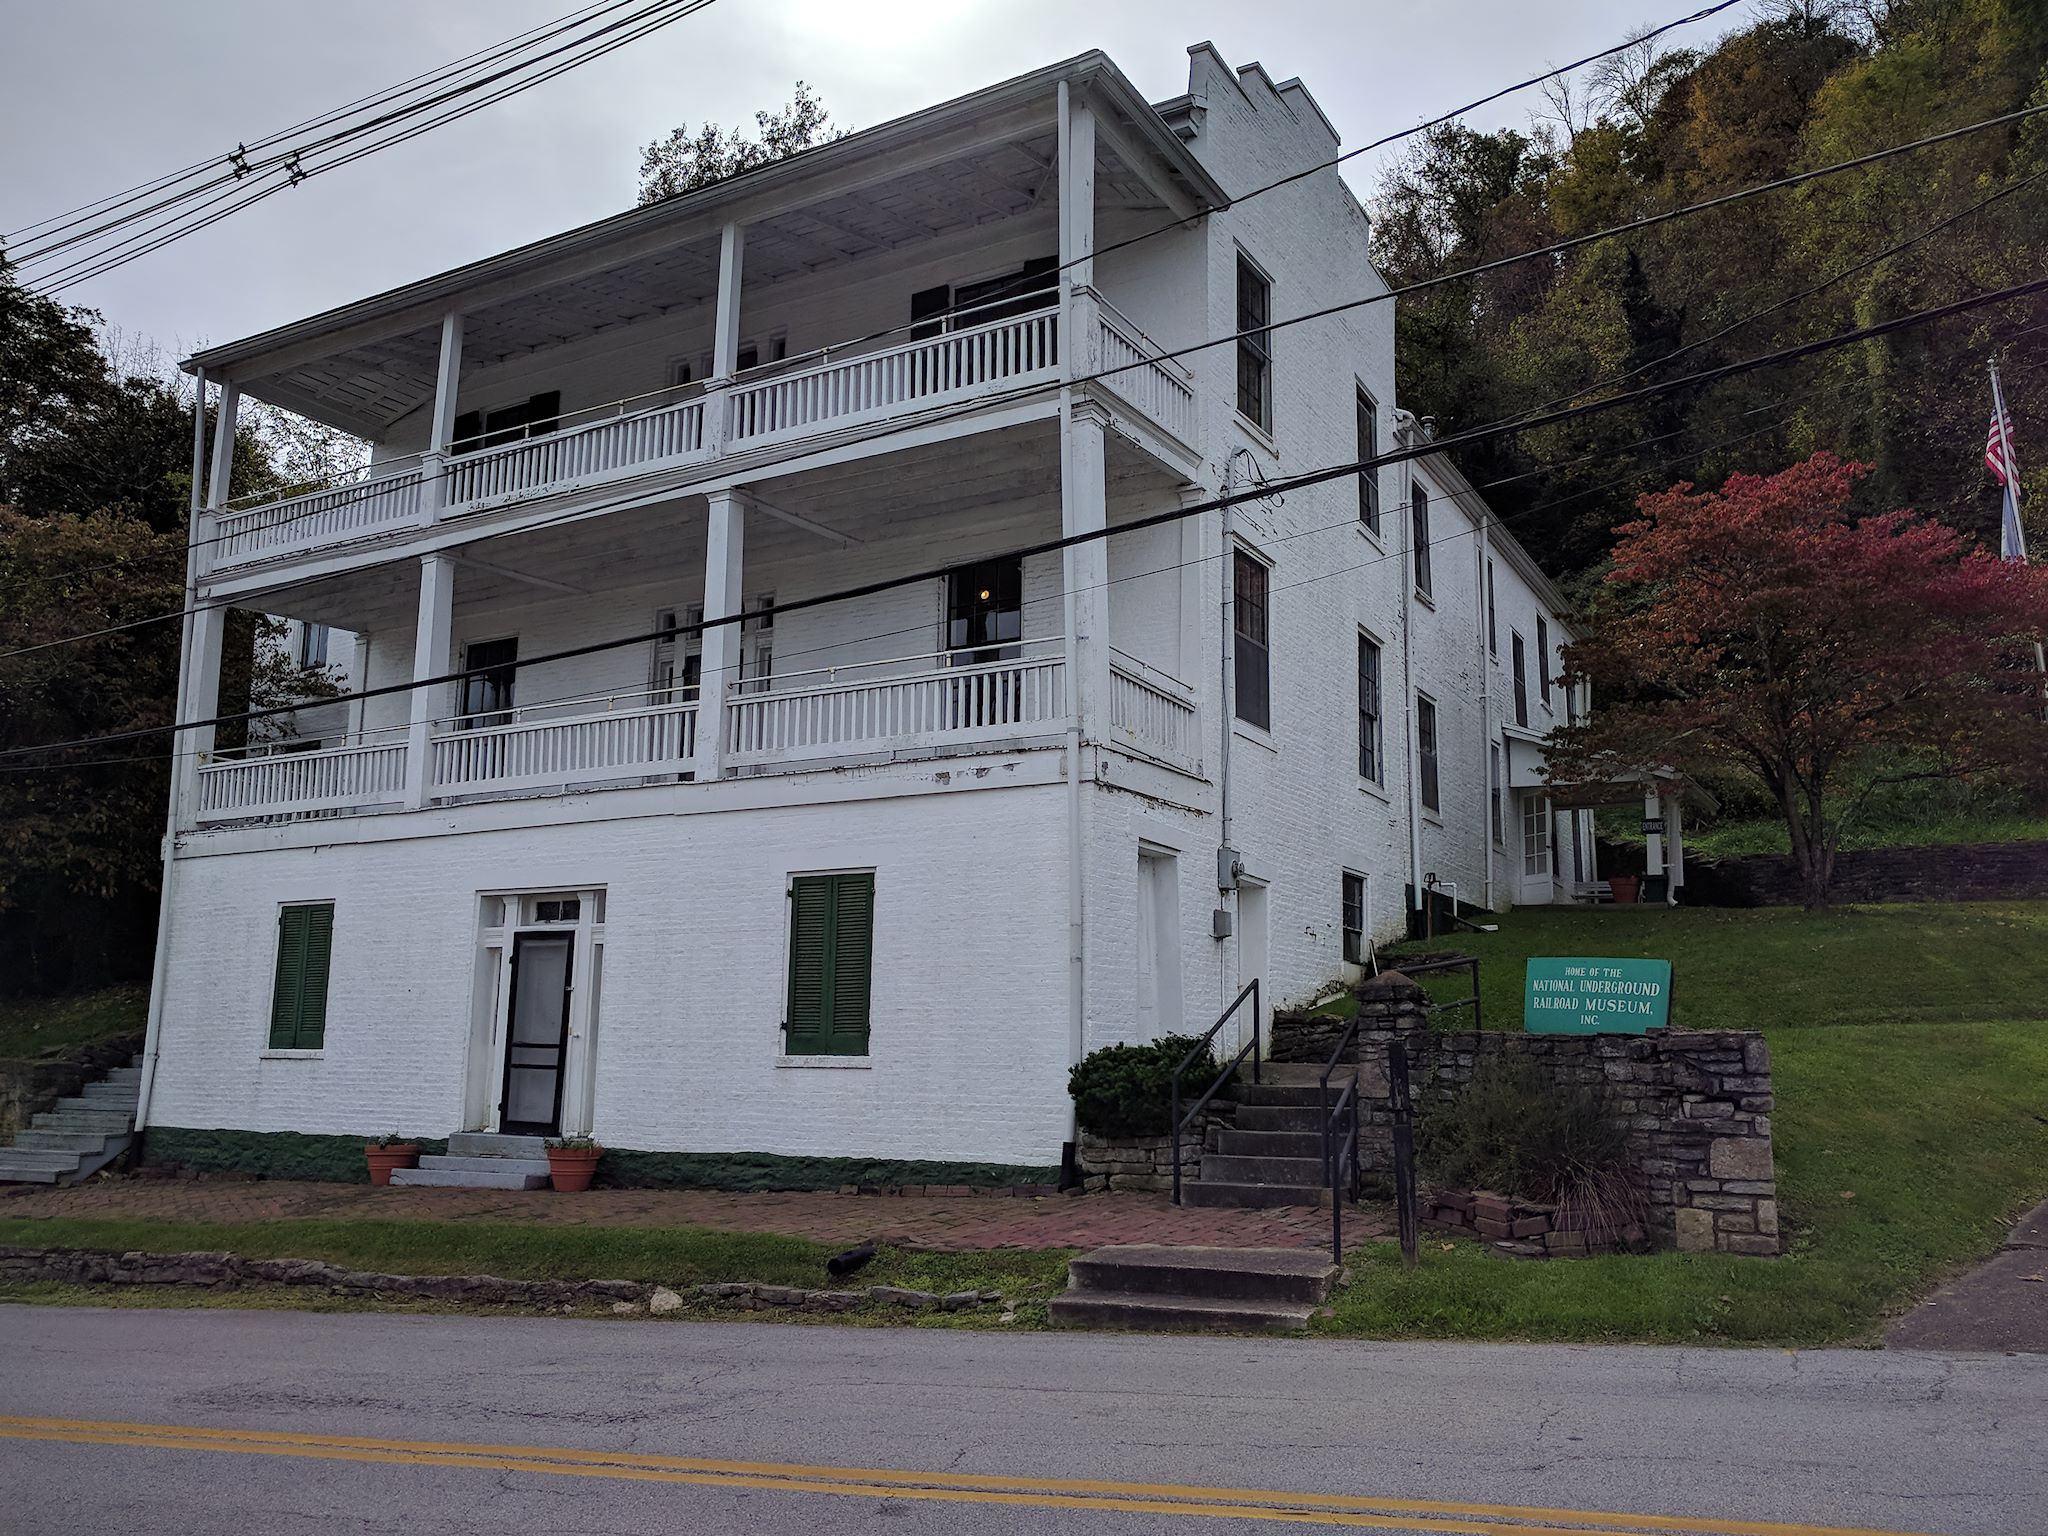 Underground Railroad Museum - Lee House